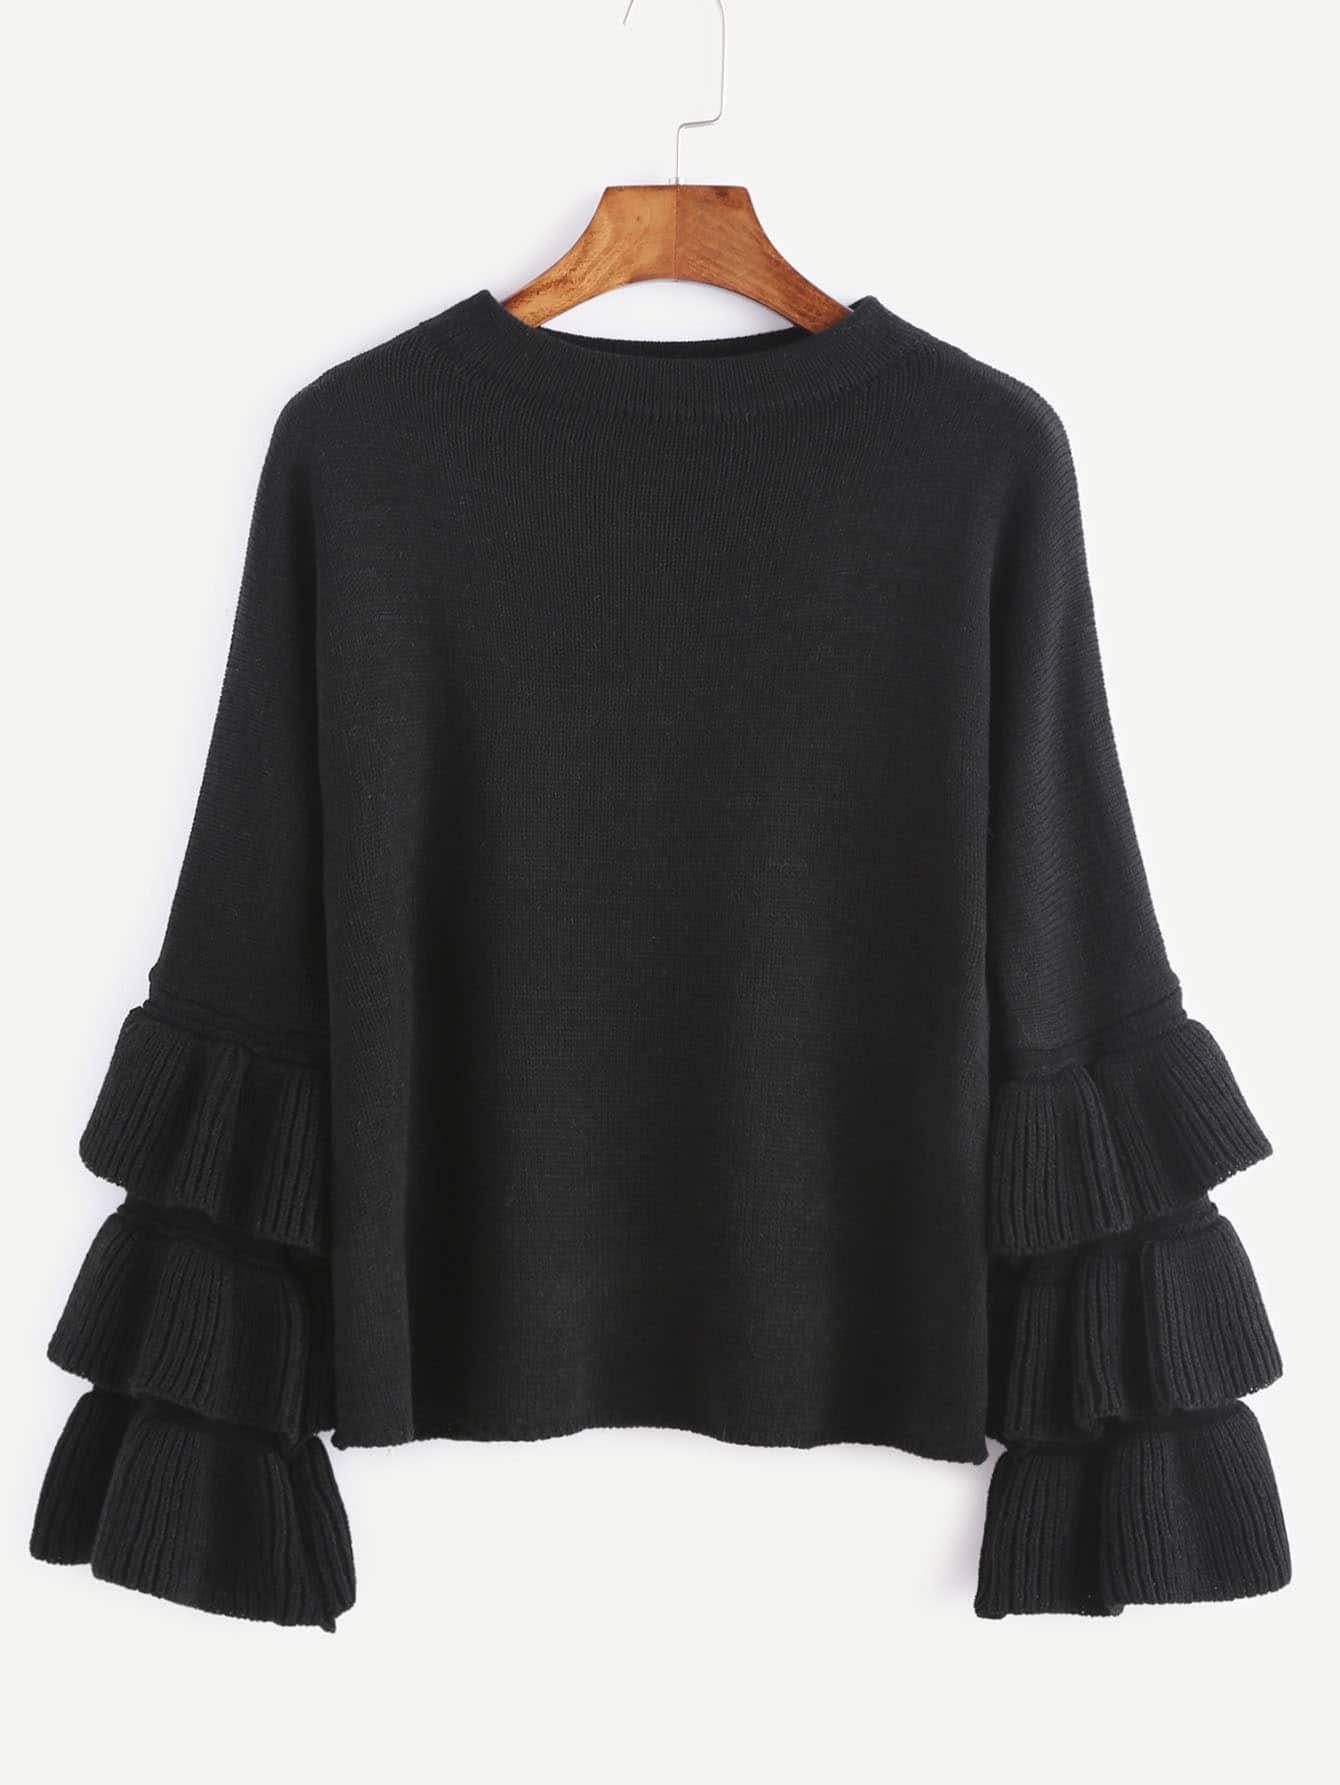 Black Layered Ruffle Sleeve Pullover Sweater